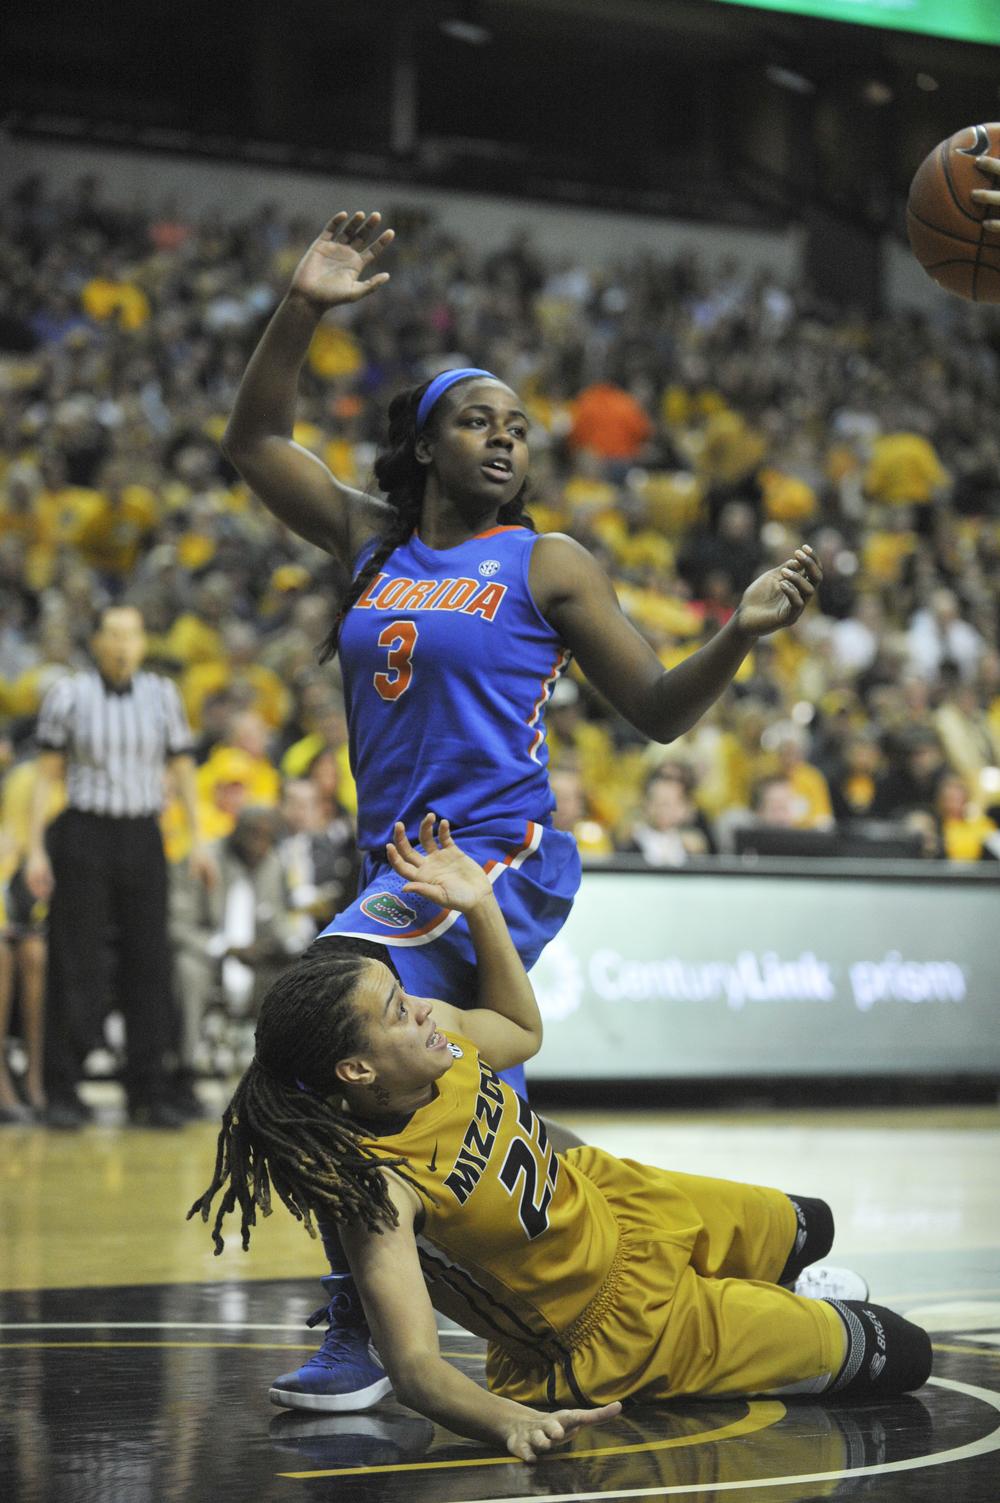 012416 1485 A Basketball - W MU vs Florida kb.jpg